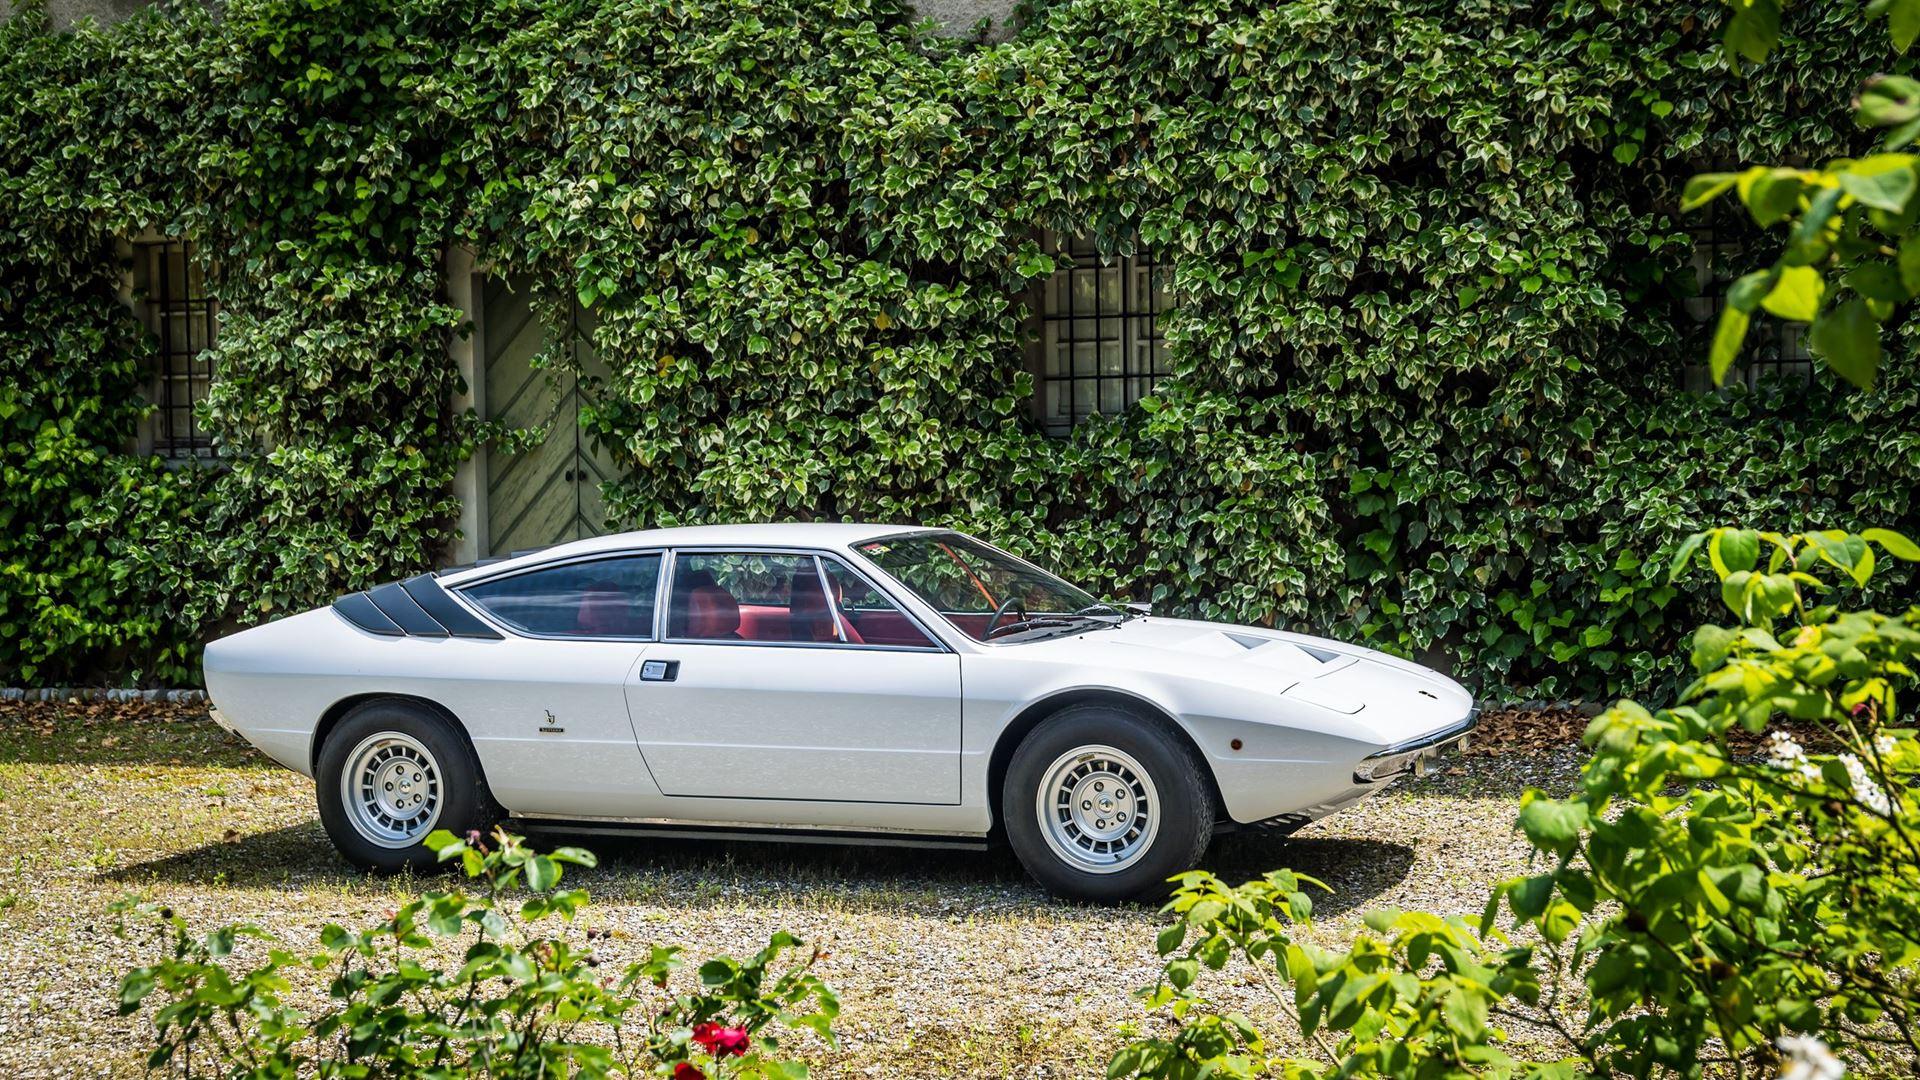 Lamborghini celebrates the 50th Anniversary of the Urraco - Image 5